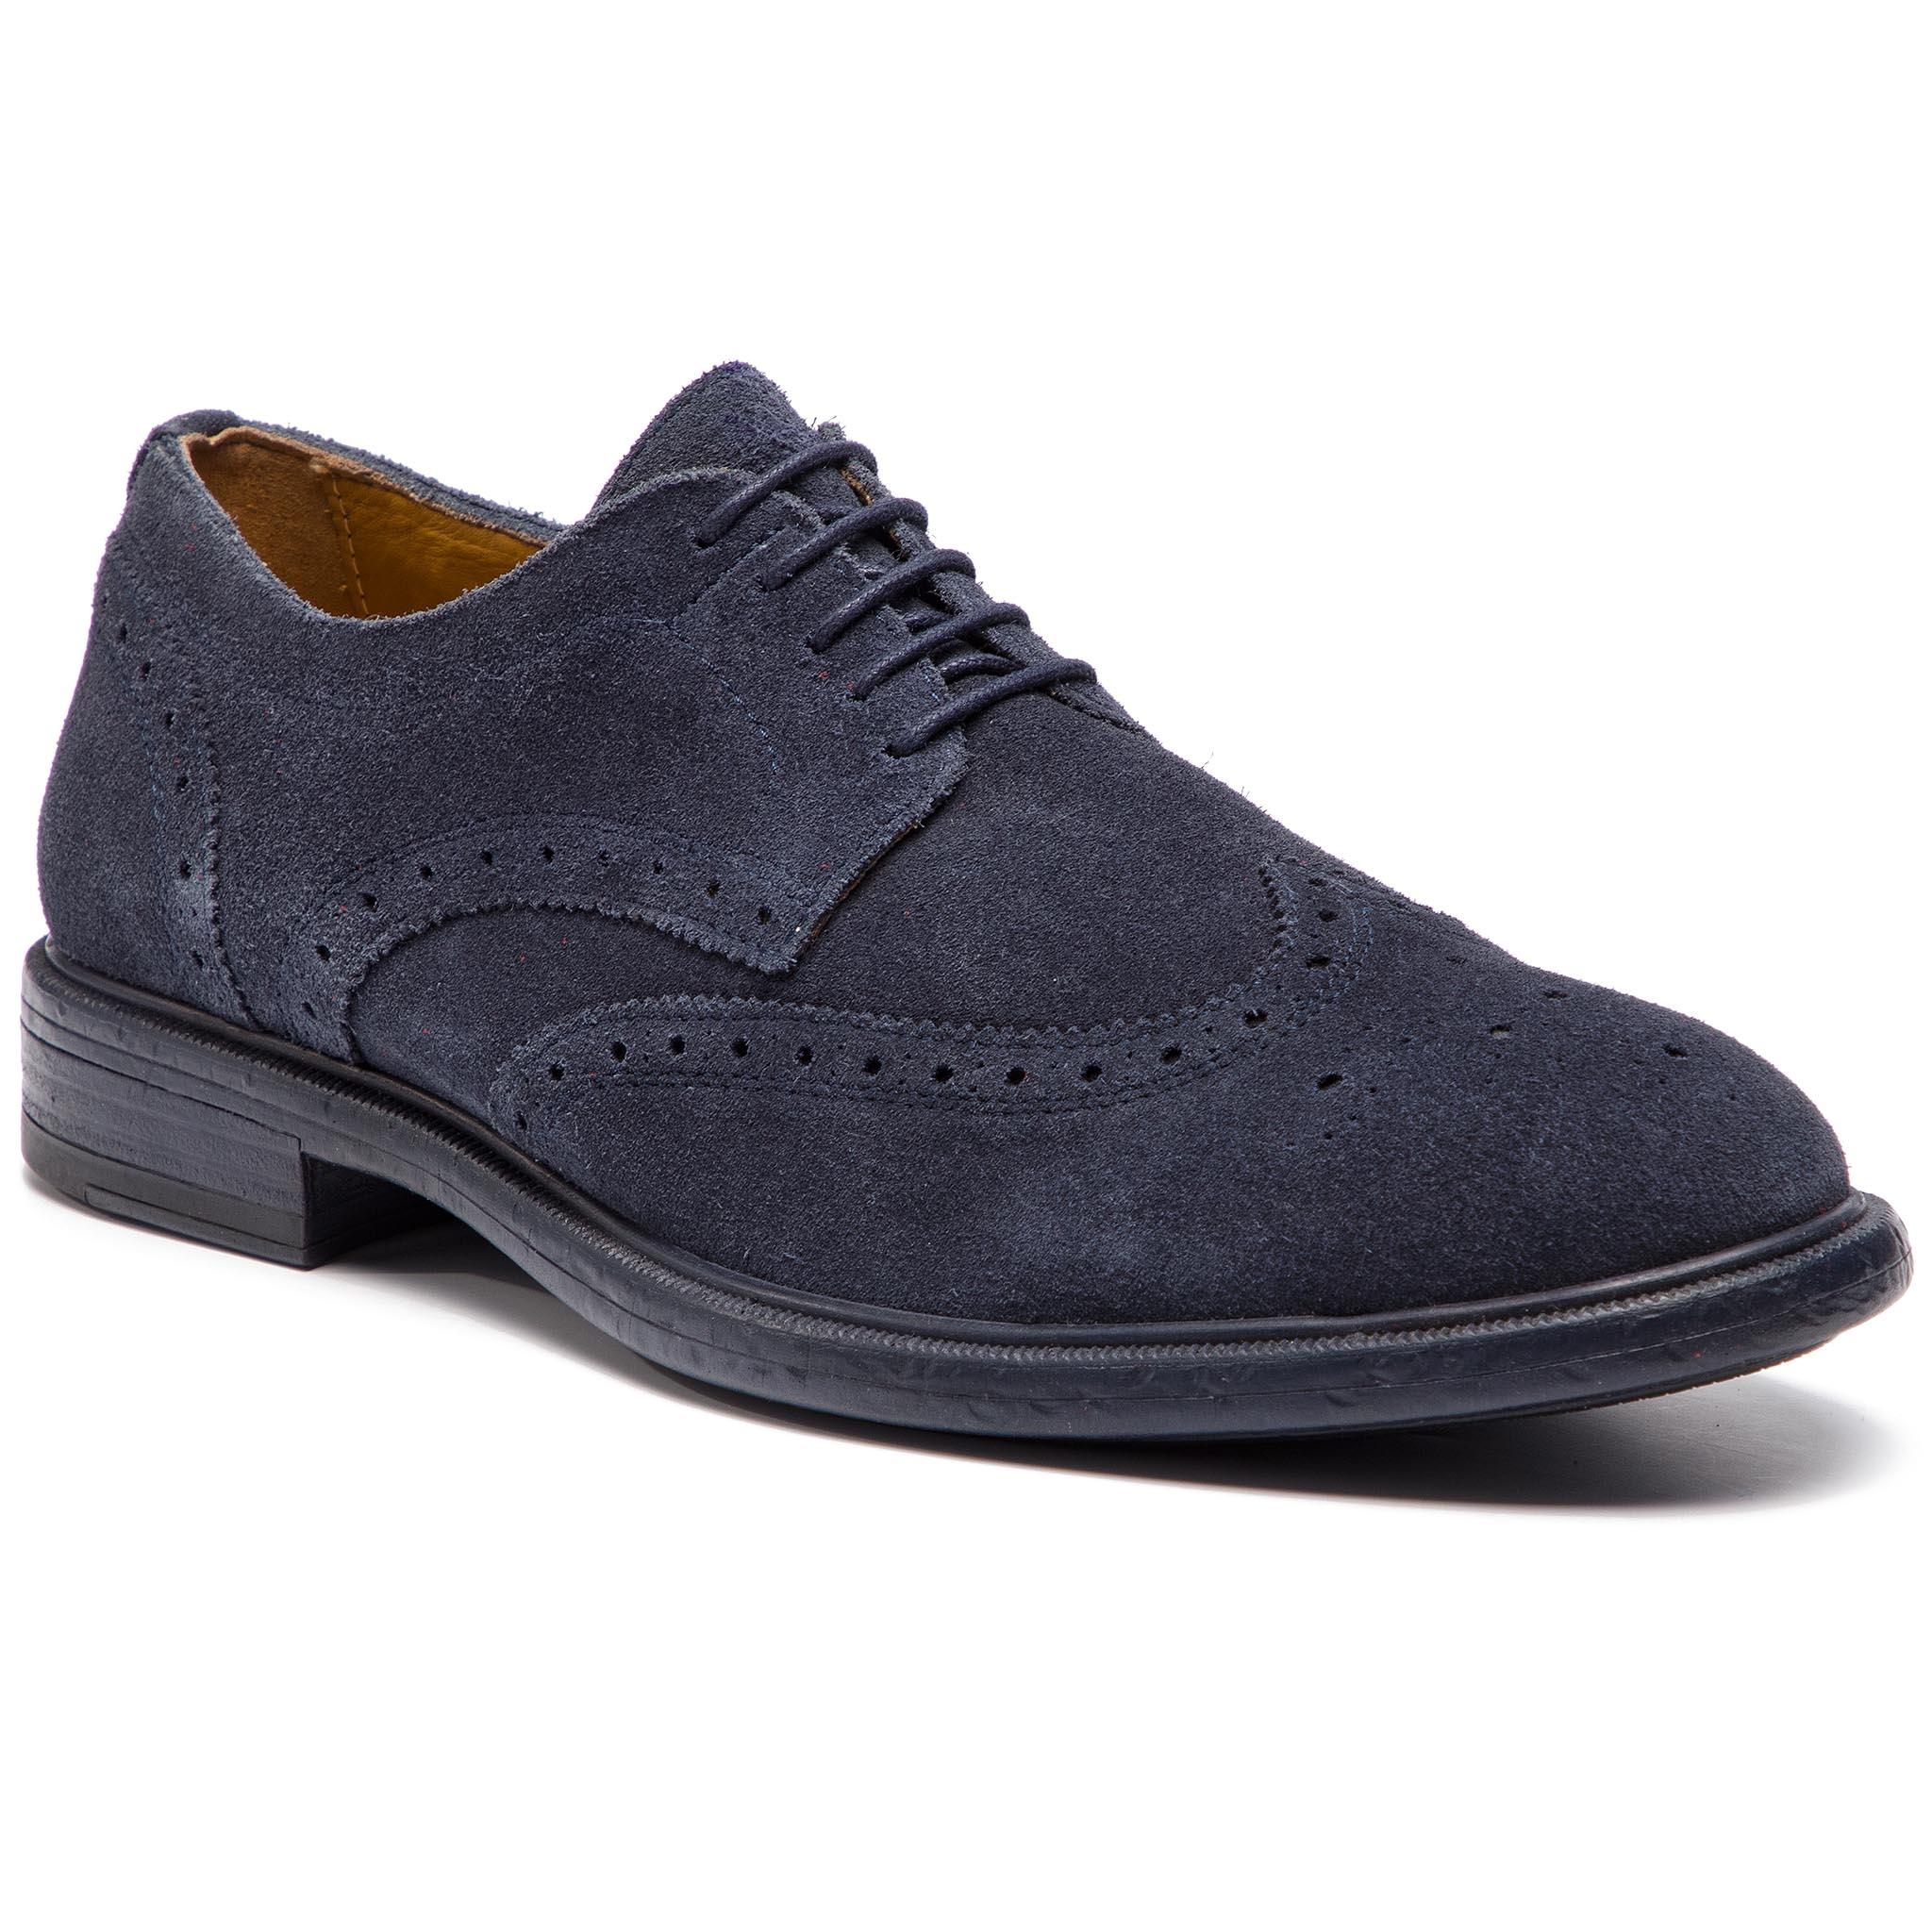 18e4c537ee8 Κλειστά παπούτσια GEOX - U Terence A U927HA 00022 C4002 Navy - Glami.gr